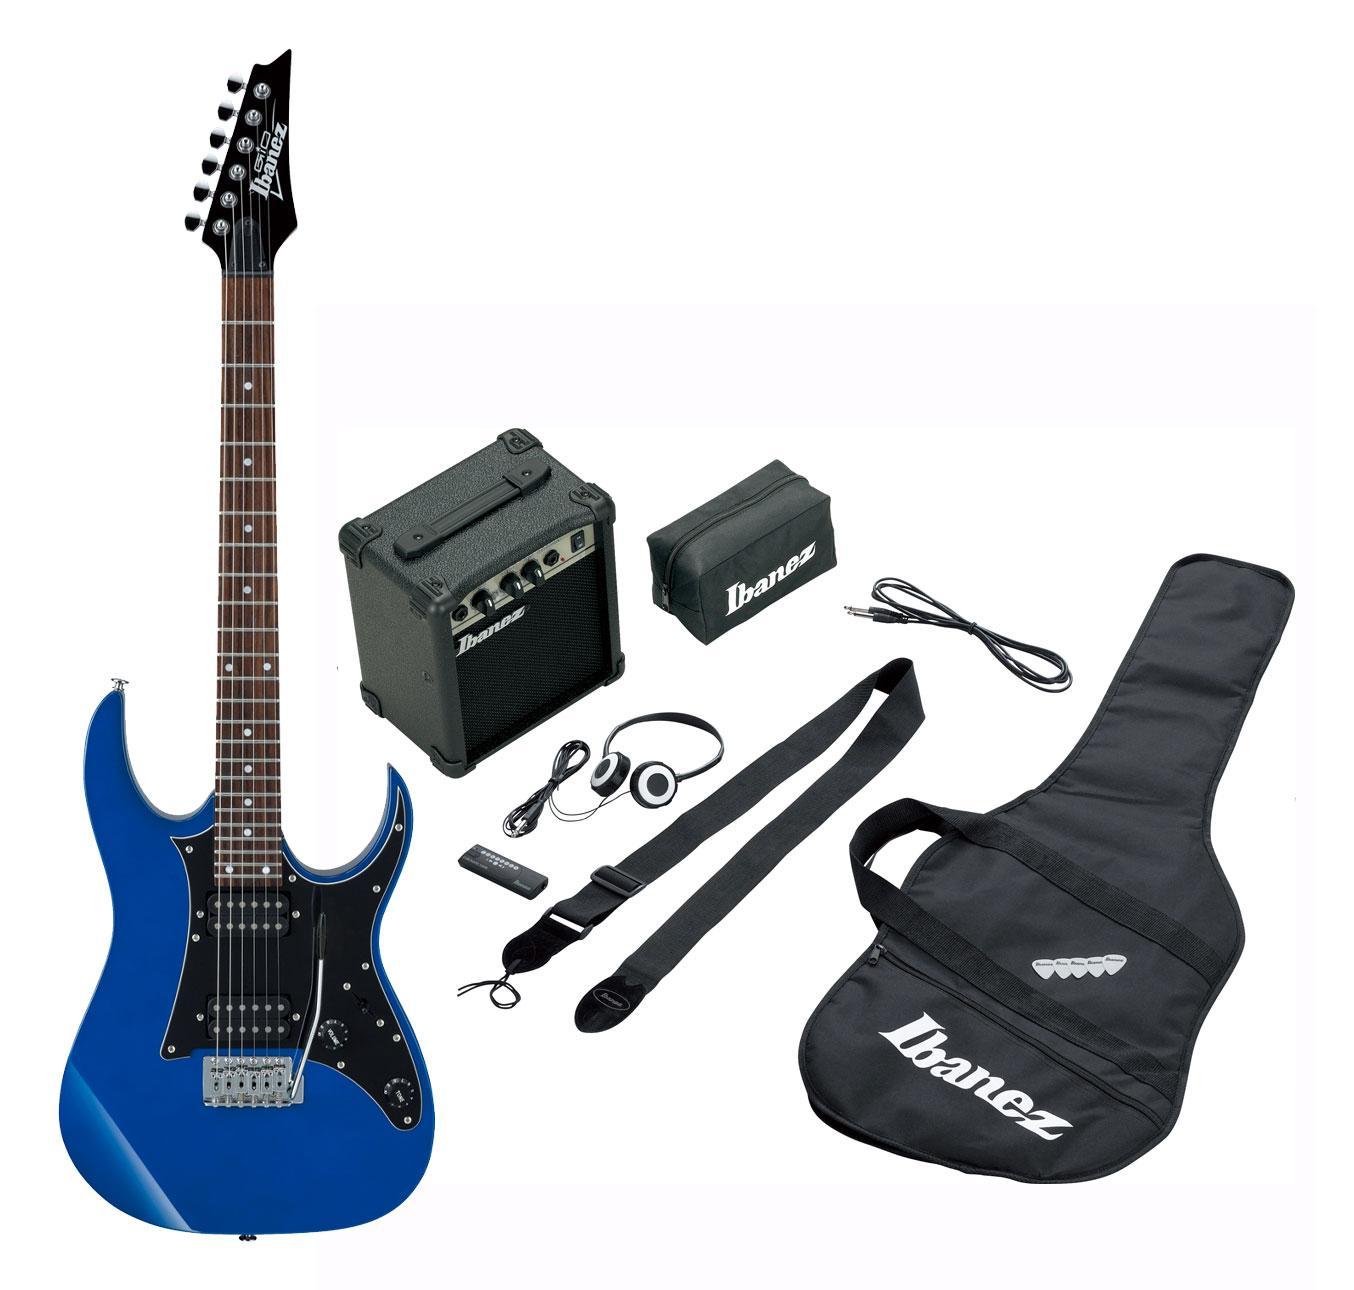 Egitarren - Ibanez IJRG200 JB Jumpstart Pack Jewel Blue Retoure (Zustand gut) - Onlineshop Musikhaus Kirstein